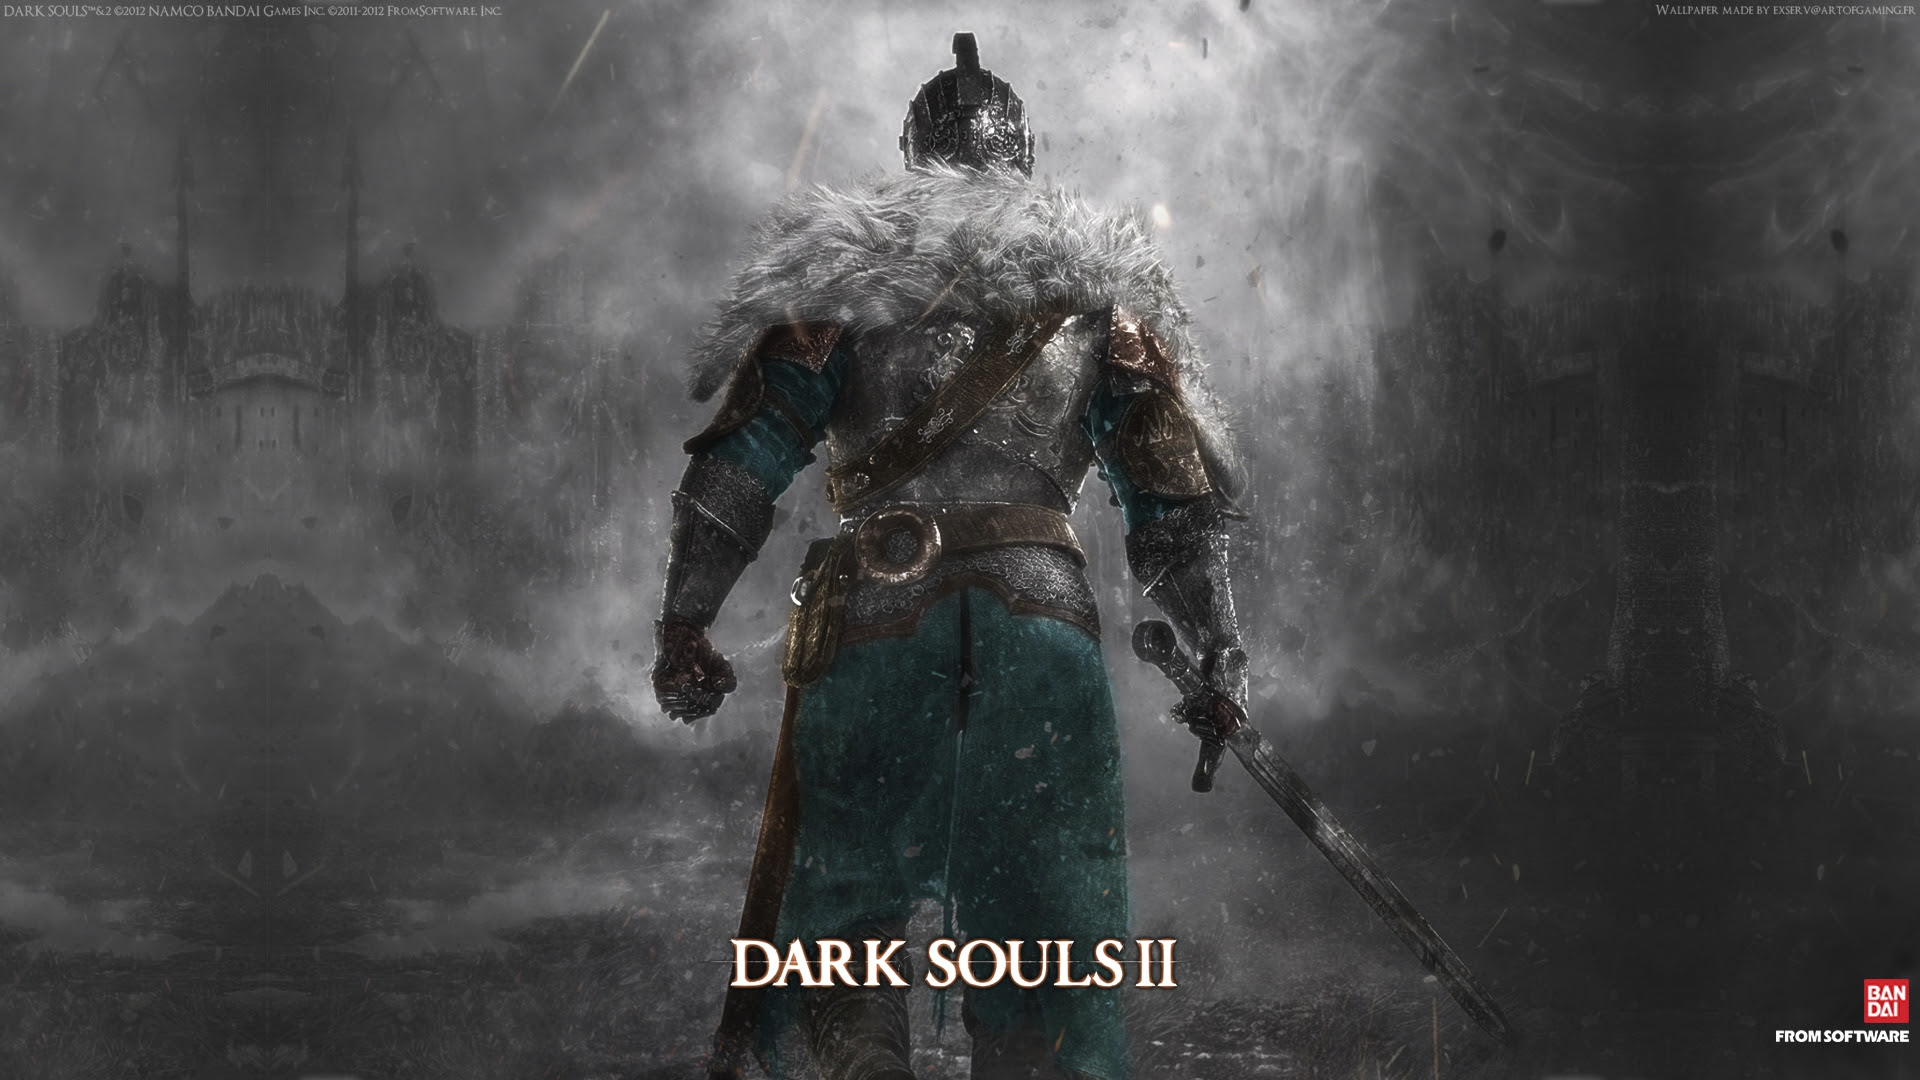 Dark Souls 2 Wallpaper 1920x1080 73850